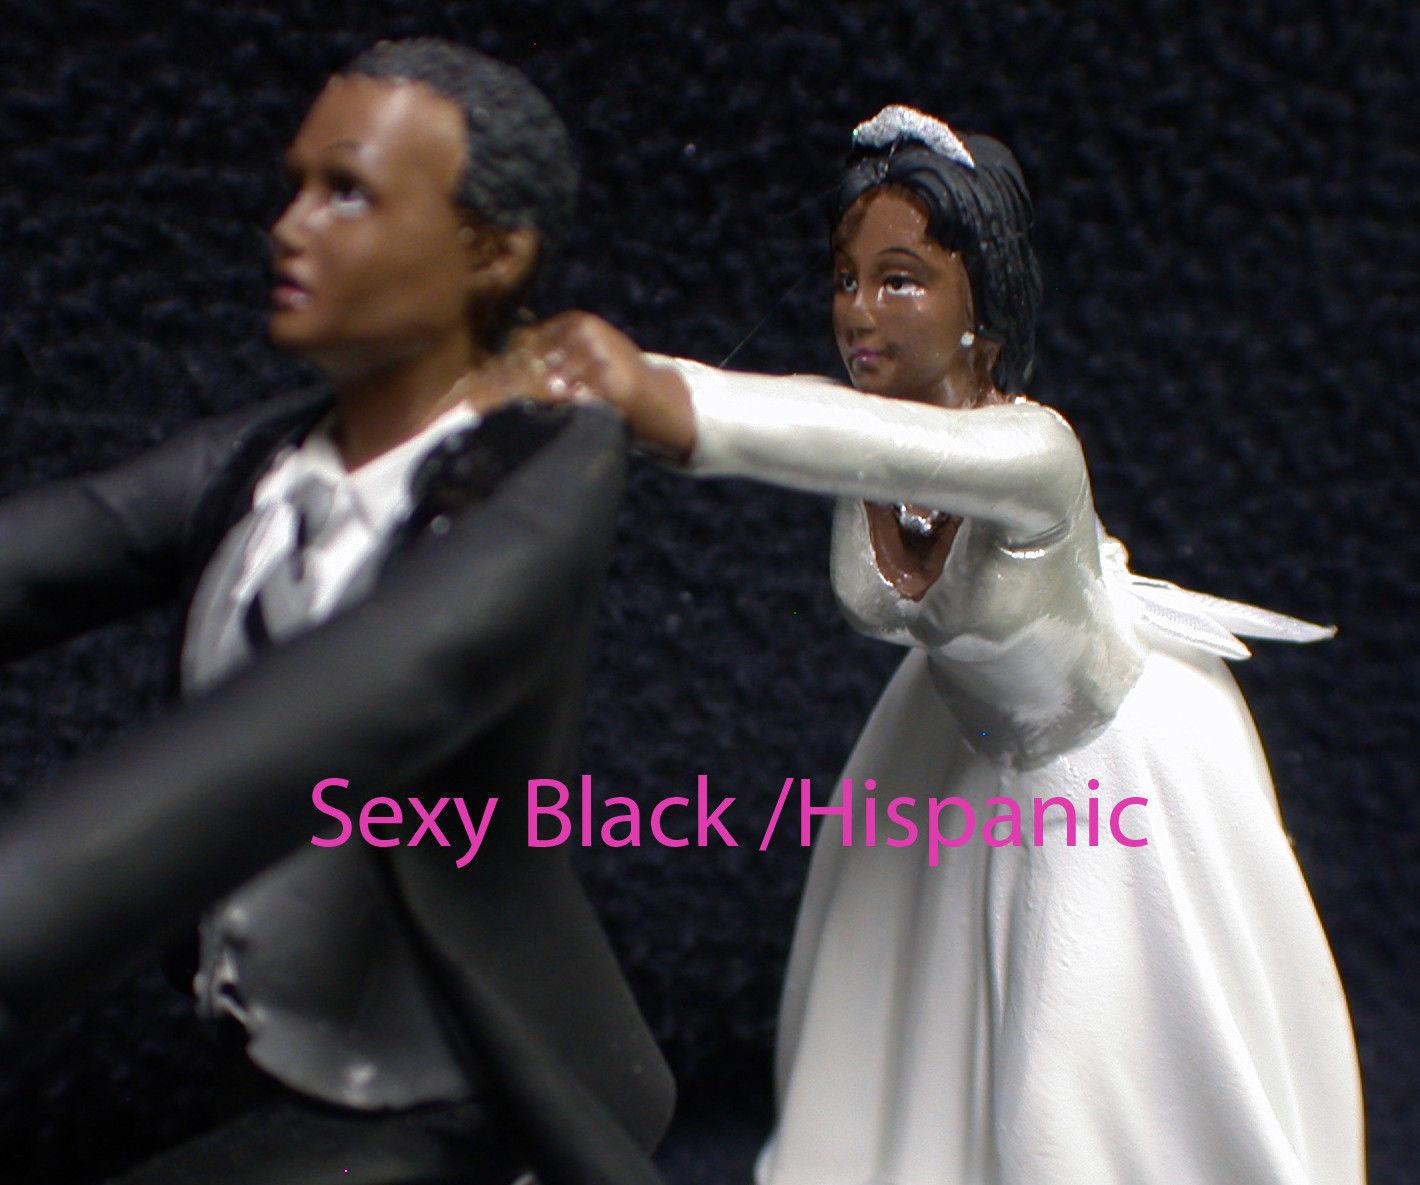 Wedding Cake Topper W/Silver Honda Motorcycle White Black Hispanic Groom top NEW